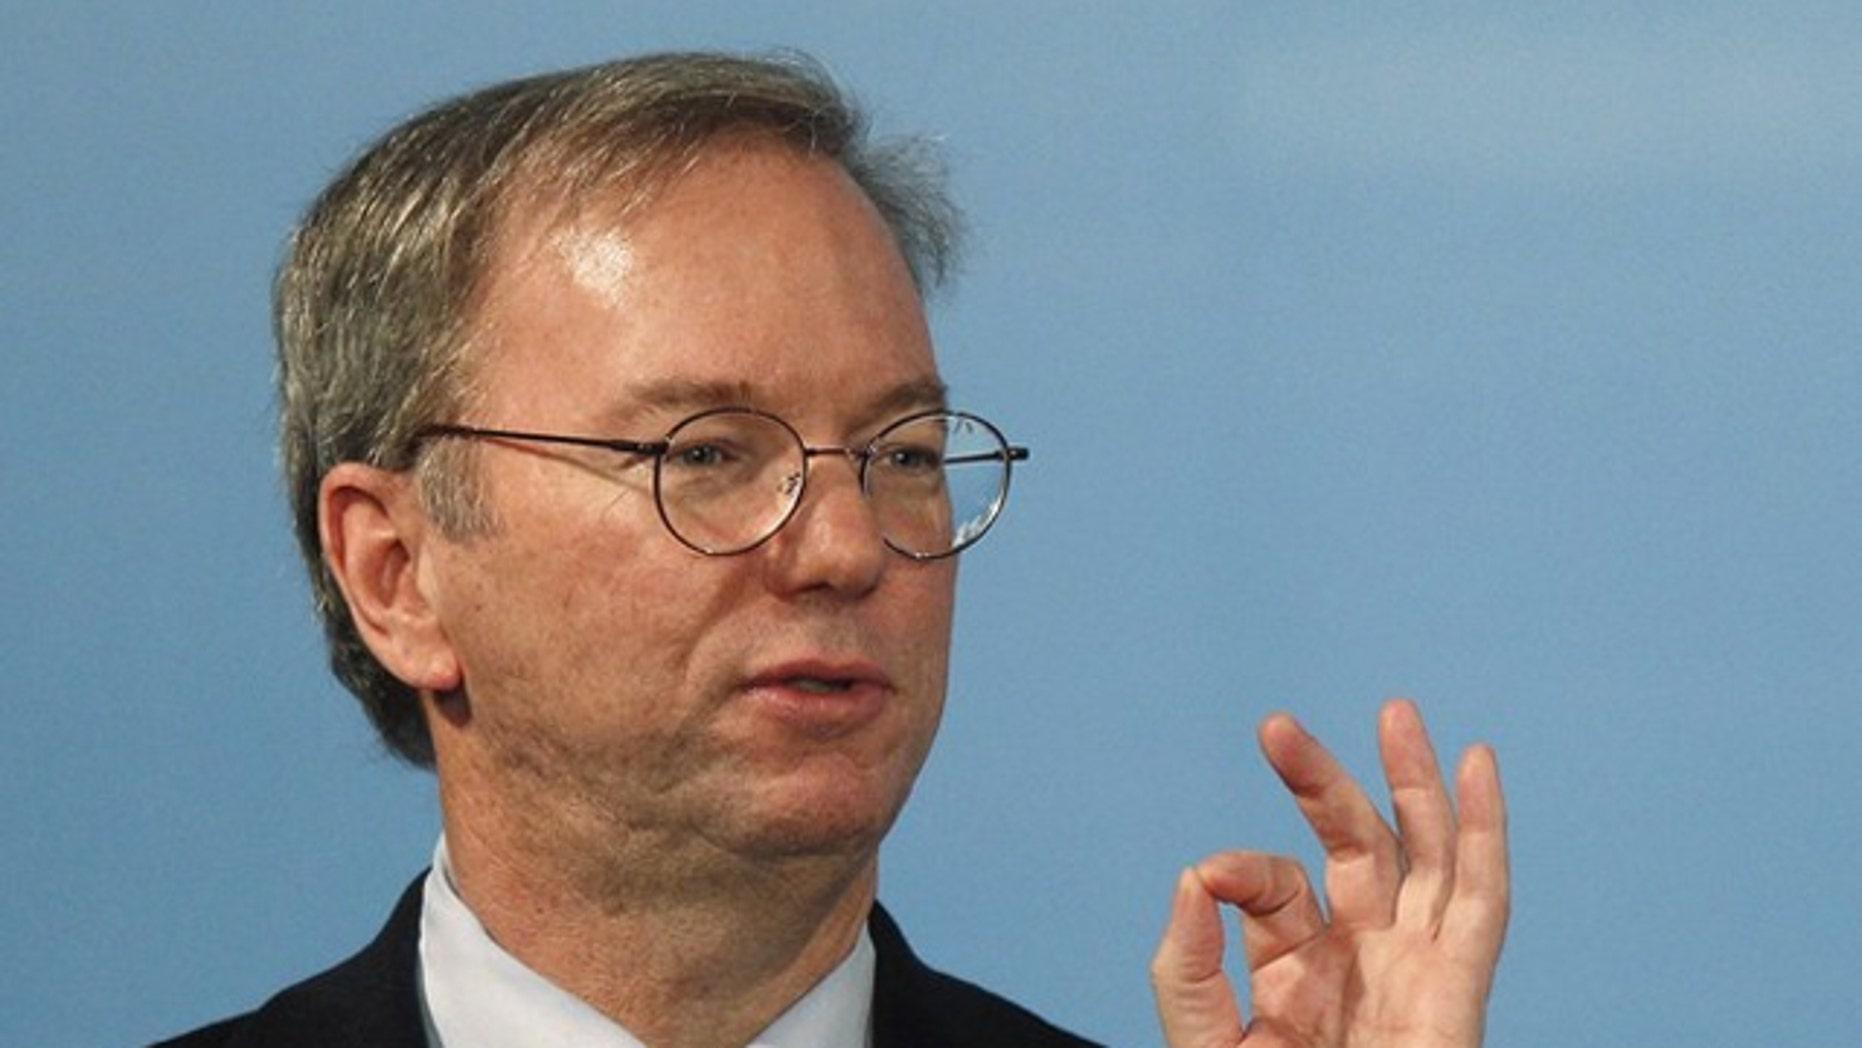 Chairman Eric Schmidt talks up a potential Google tablet.